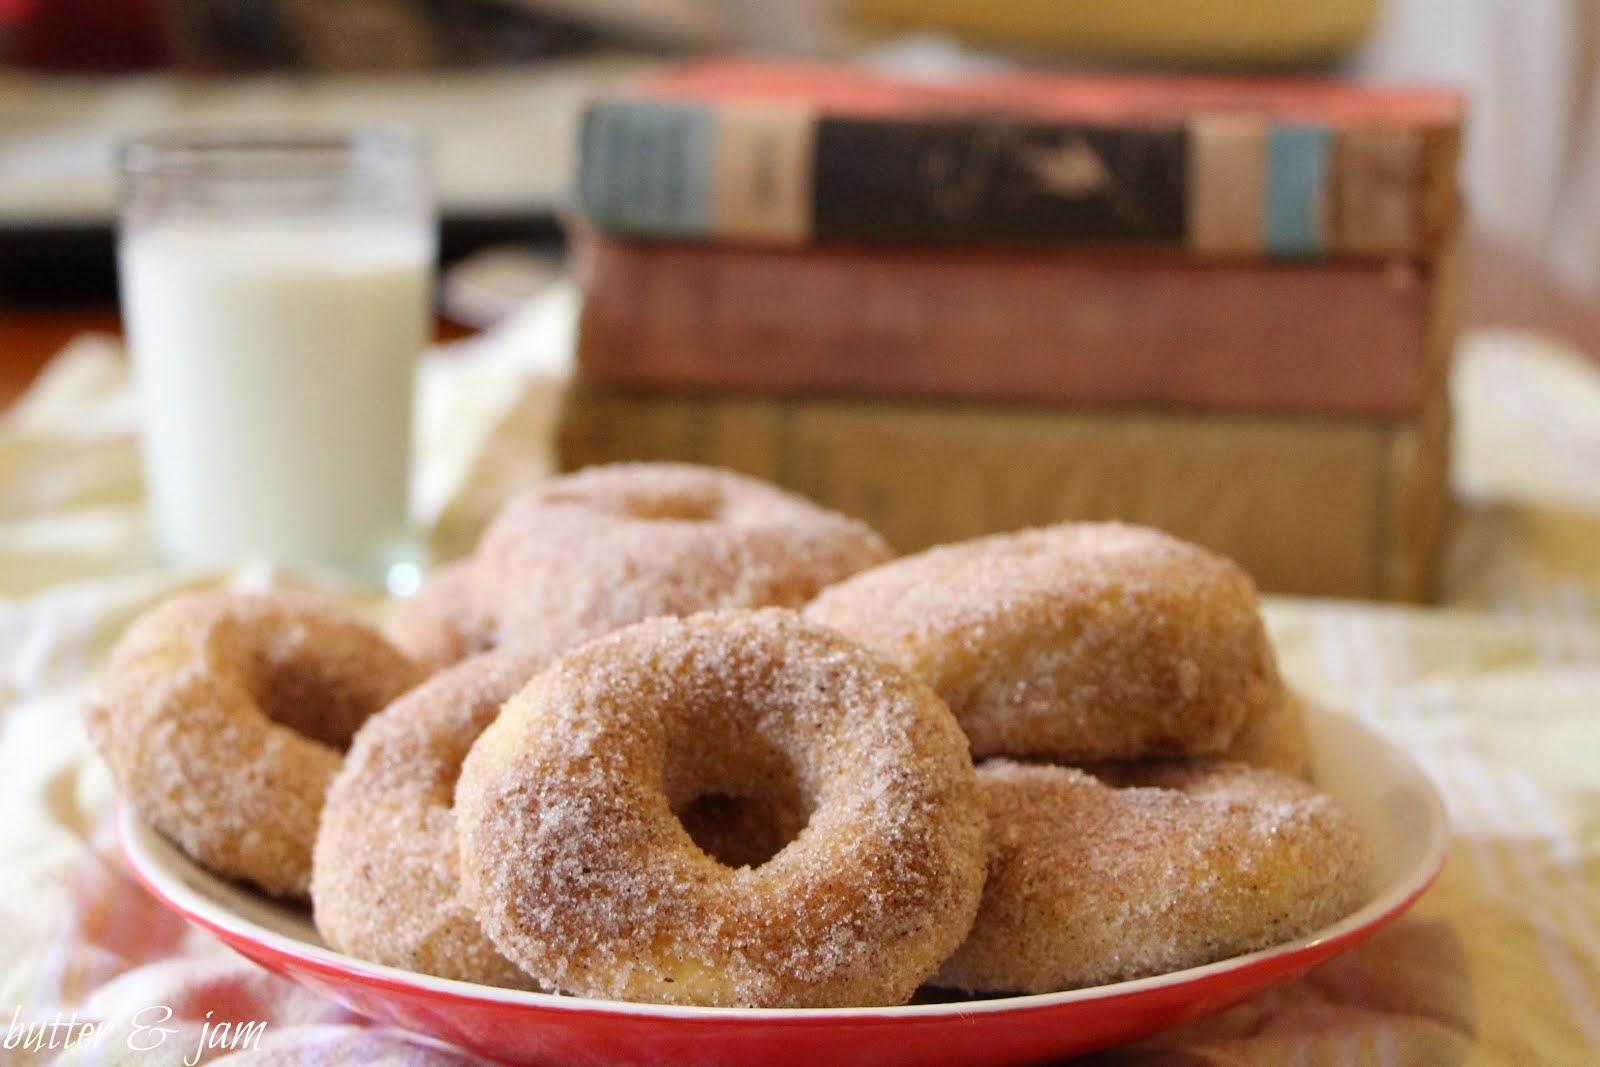 cinnamon + sugar doughnuts